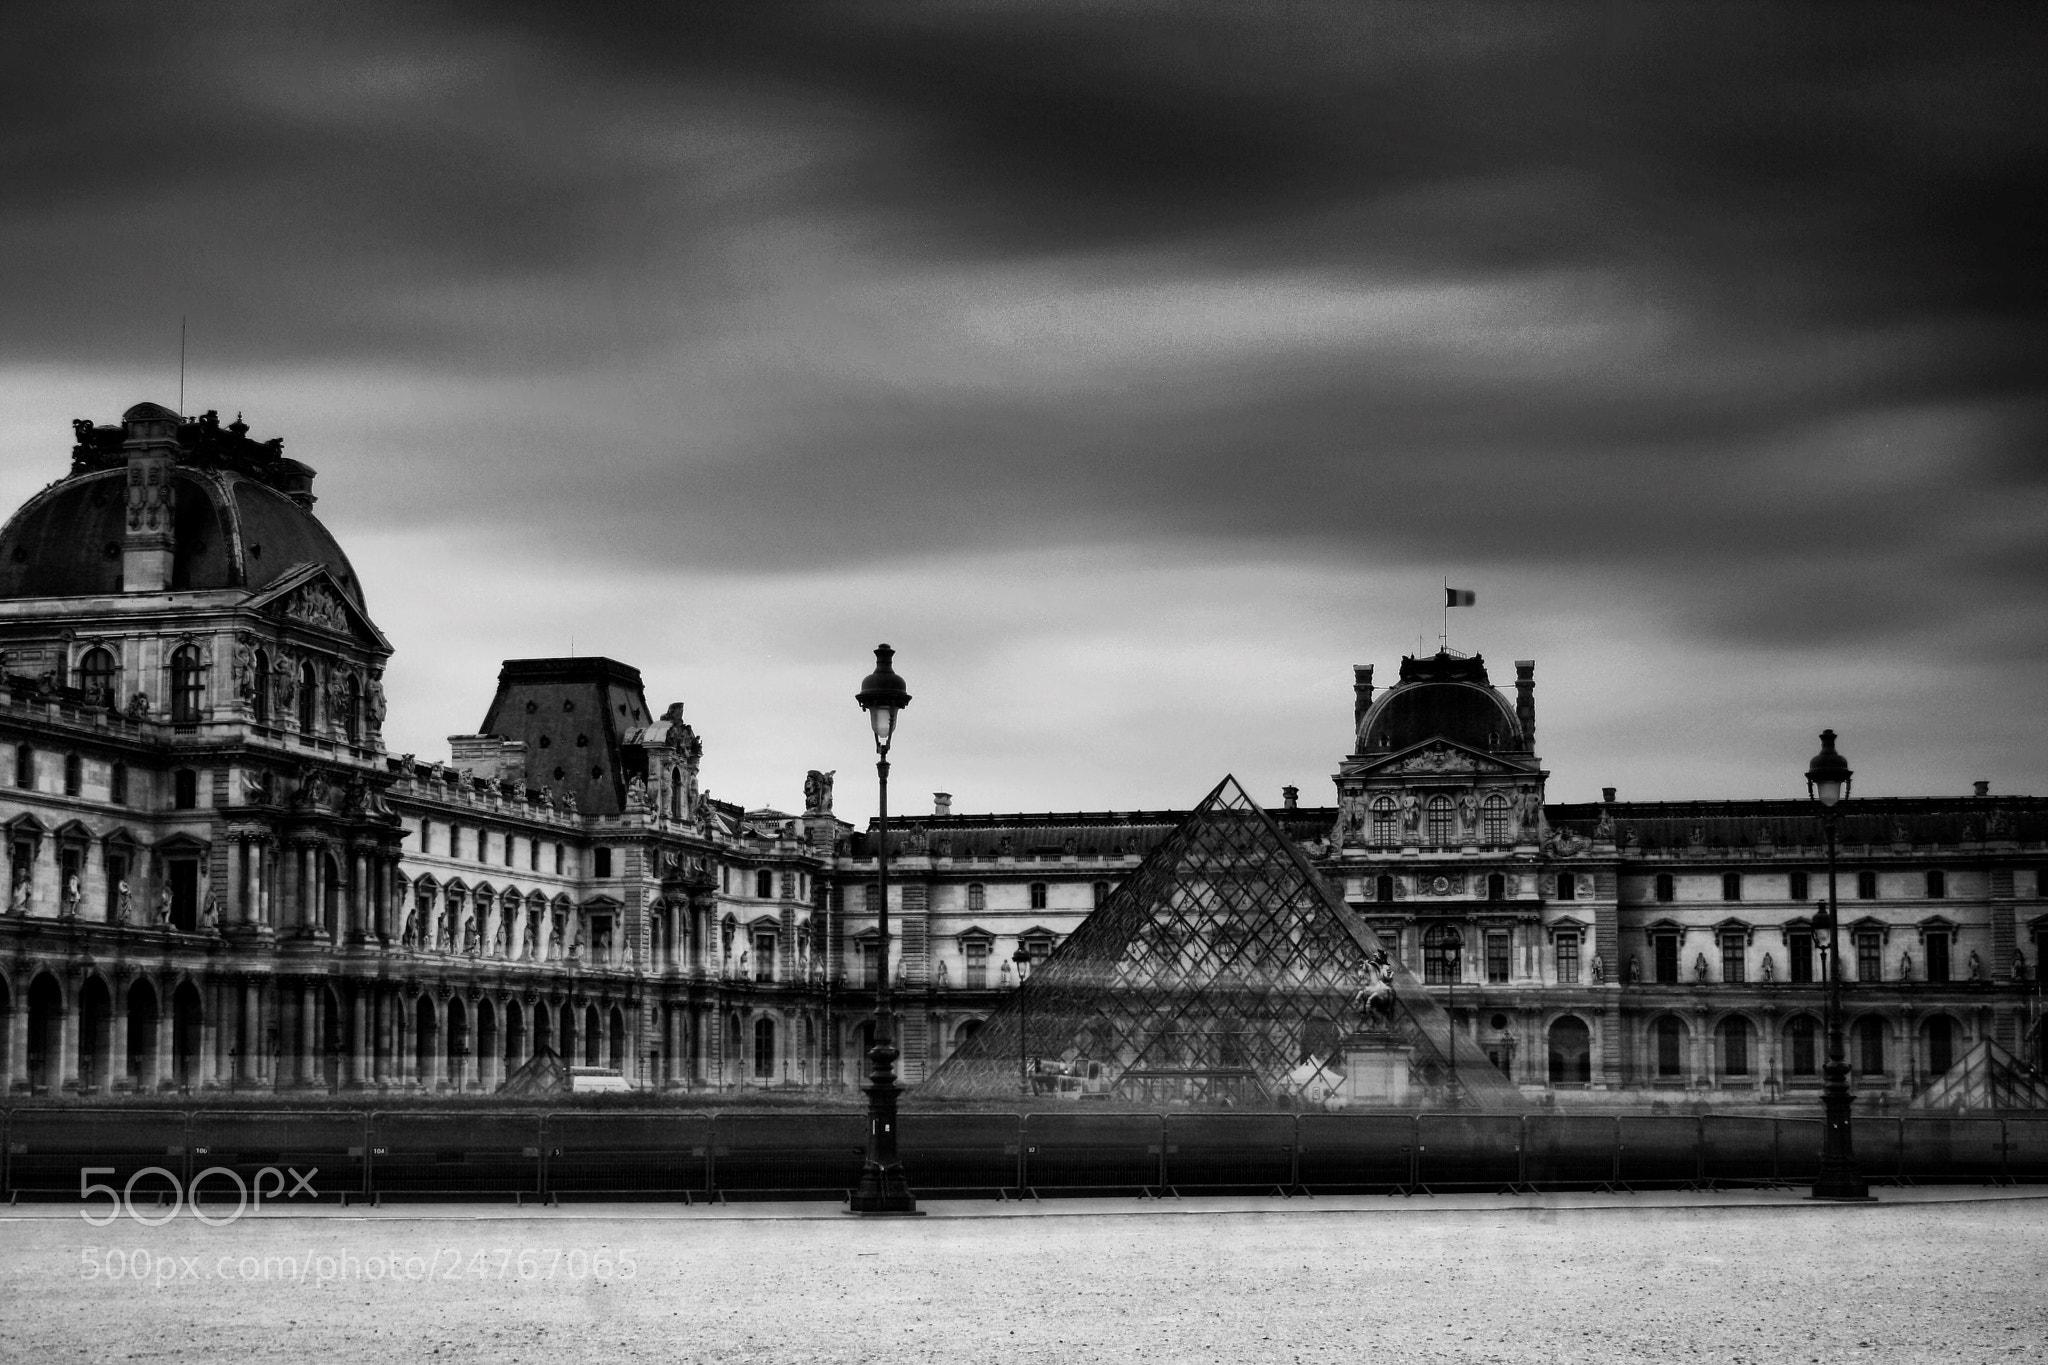 Photograph Le Louvre by Jurjen Harmsma on 500px